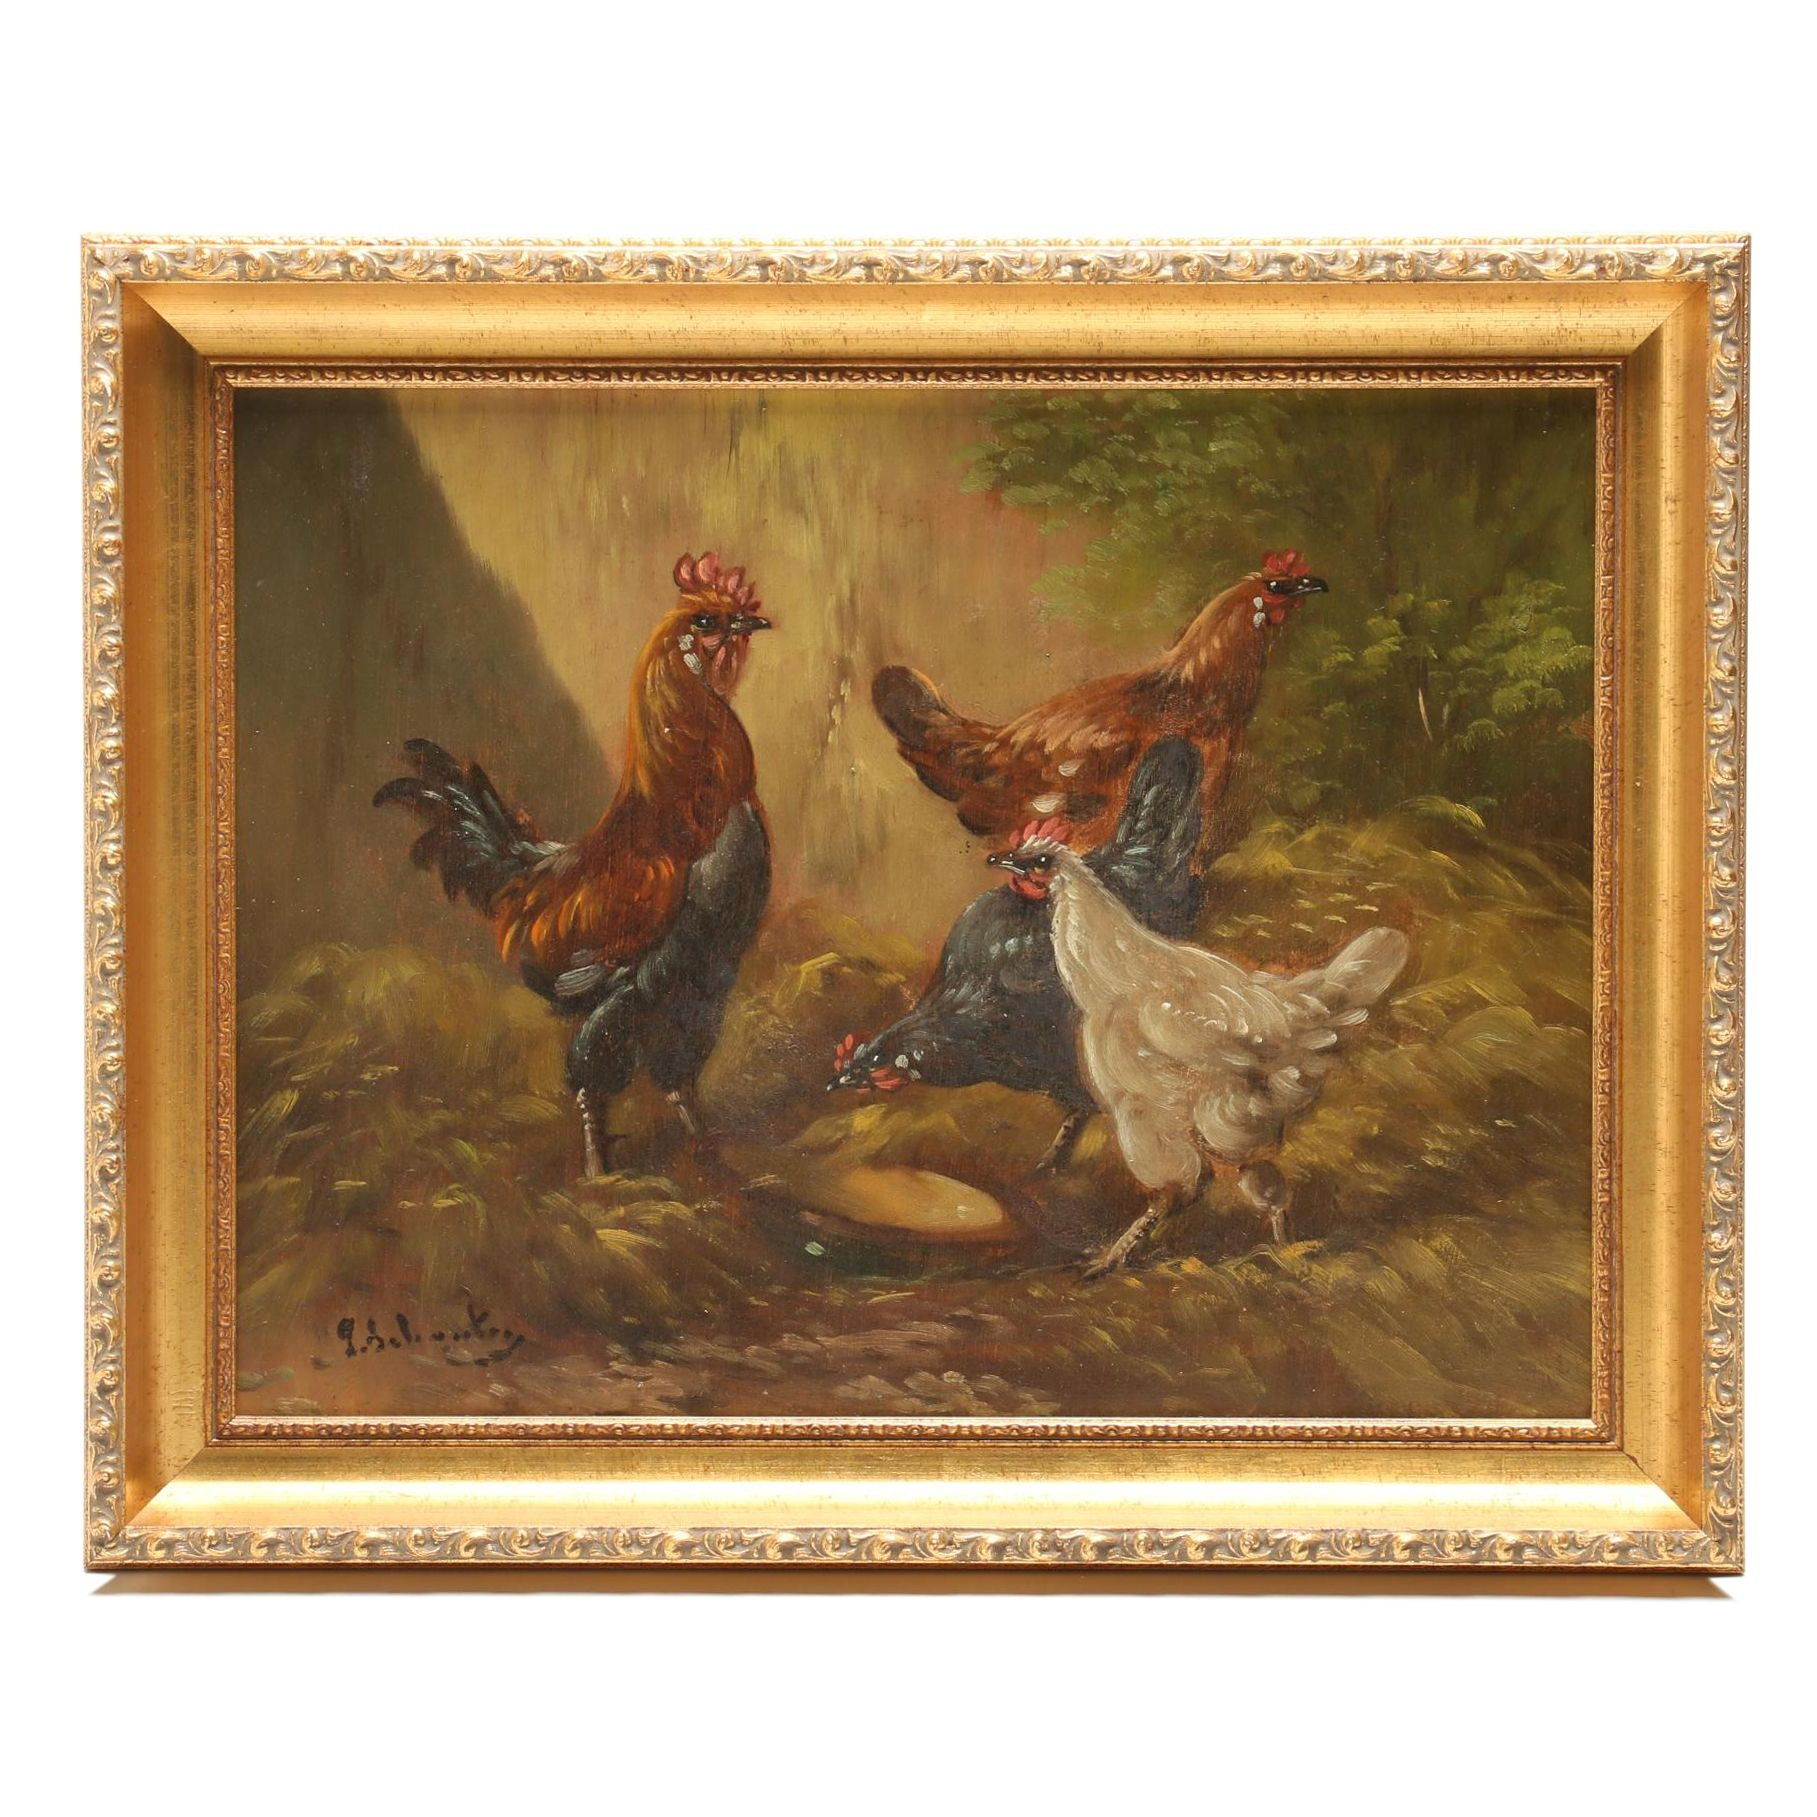 Late 19th-Century Barnyard Genre Oil Painting